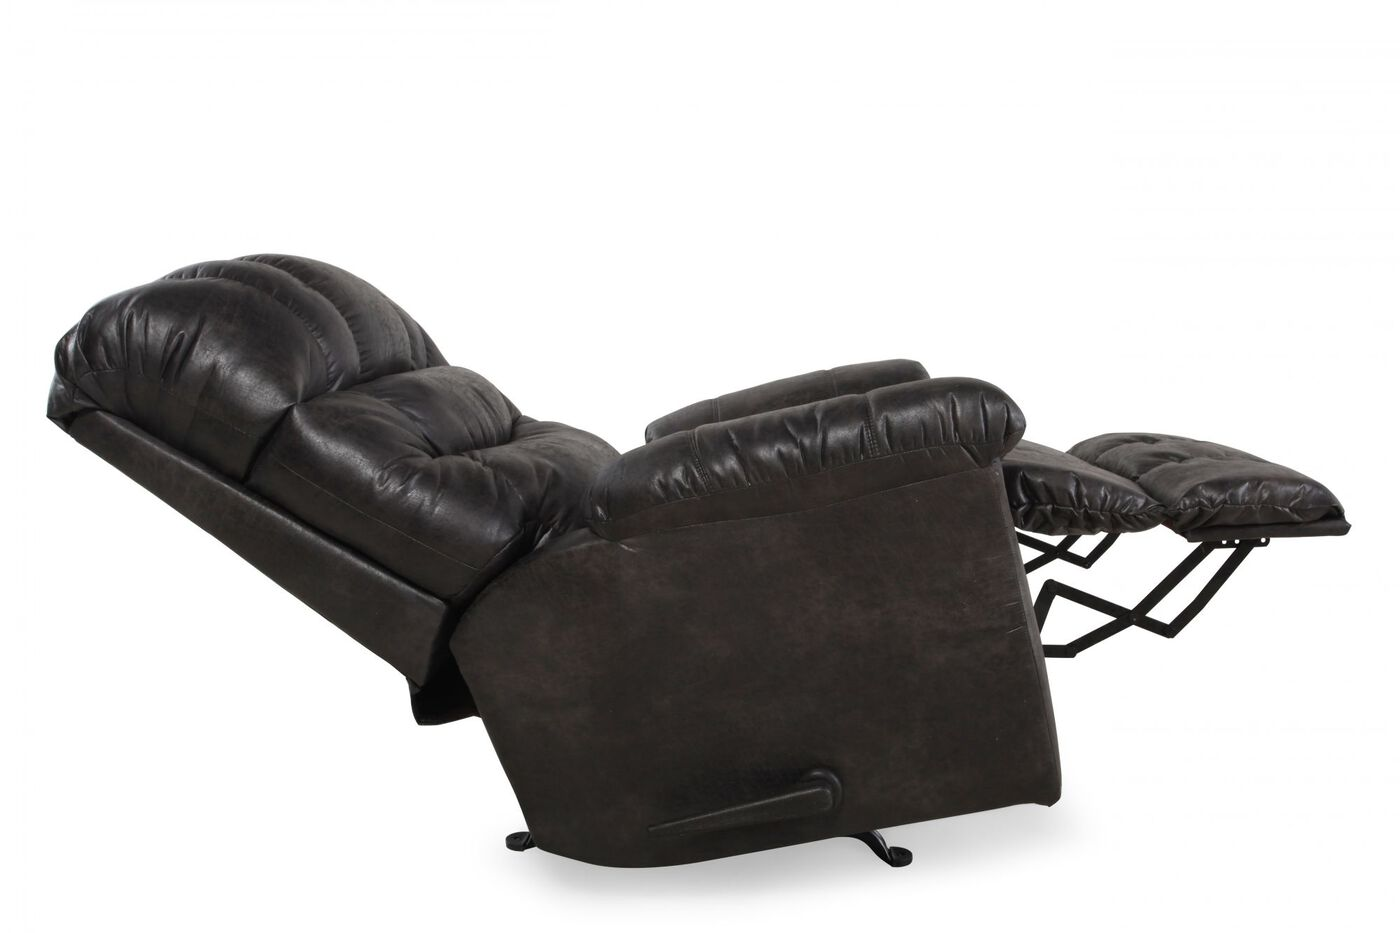 Lane zero gravity norfolk steel rocking recliner mathis - Zero gravity recliner chair for living room ...